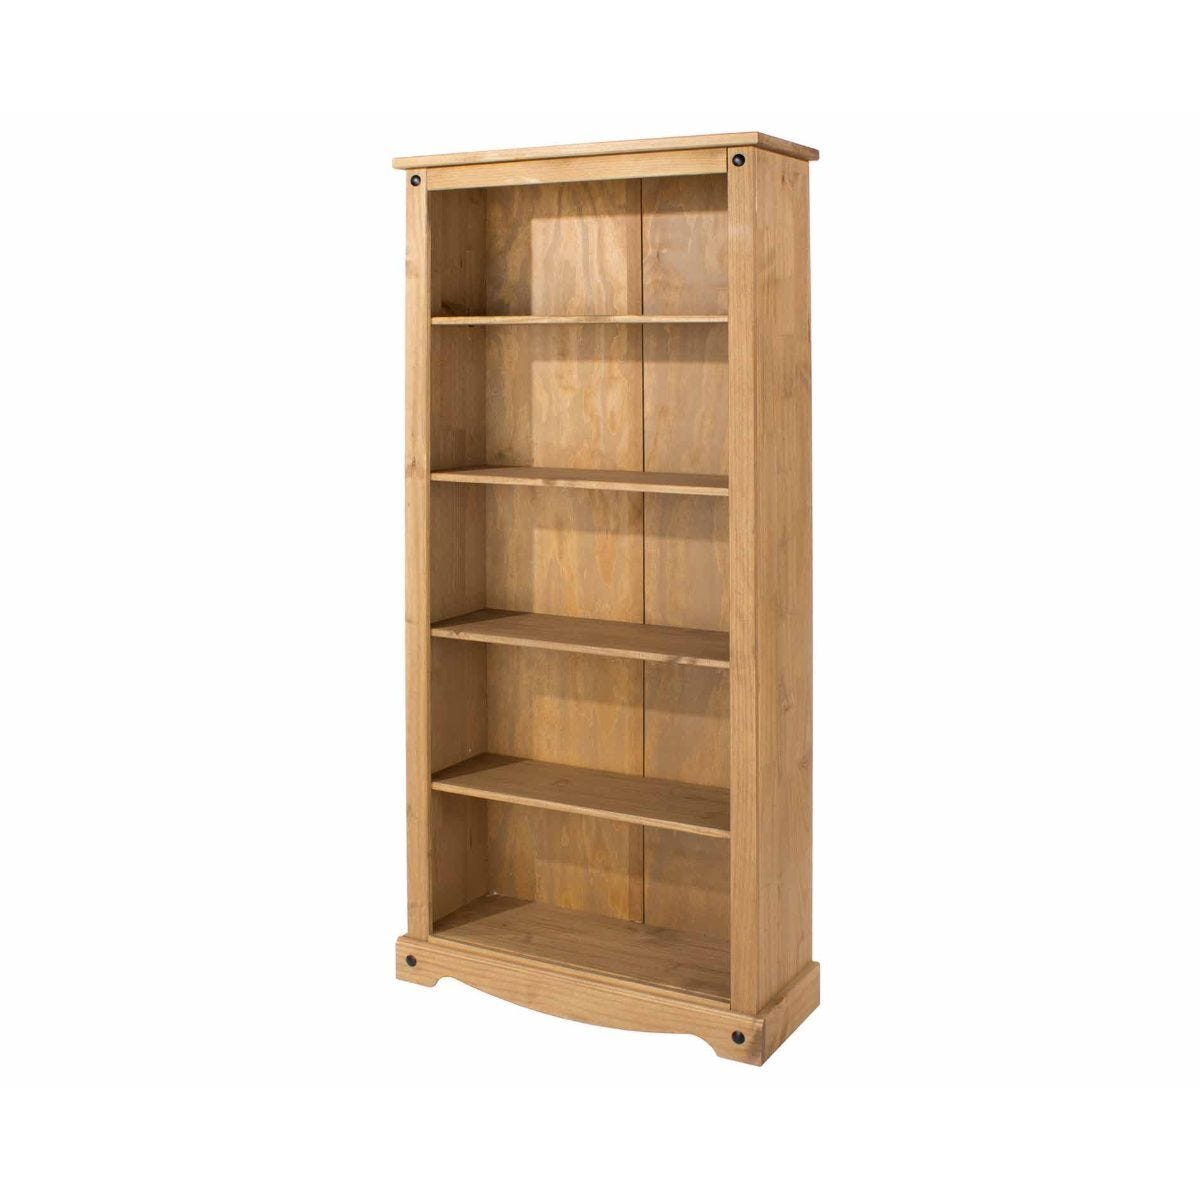 Corona Antique Wax Tall Bookcase